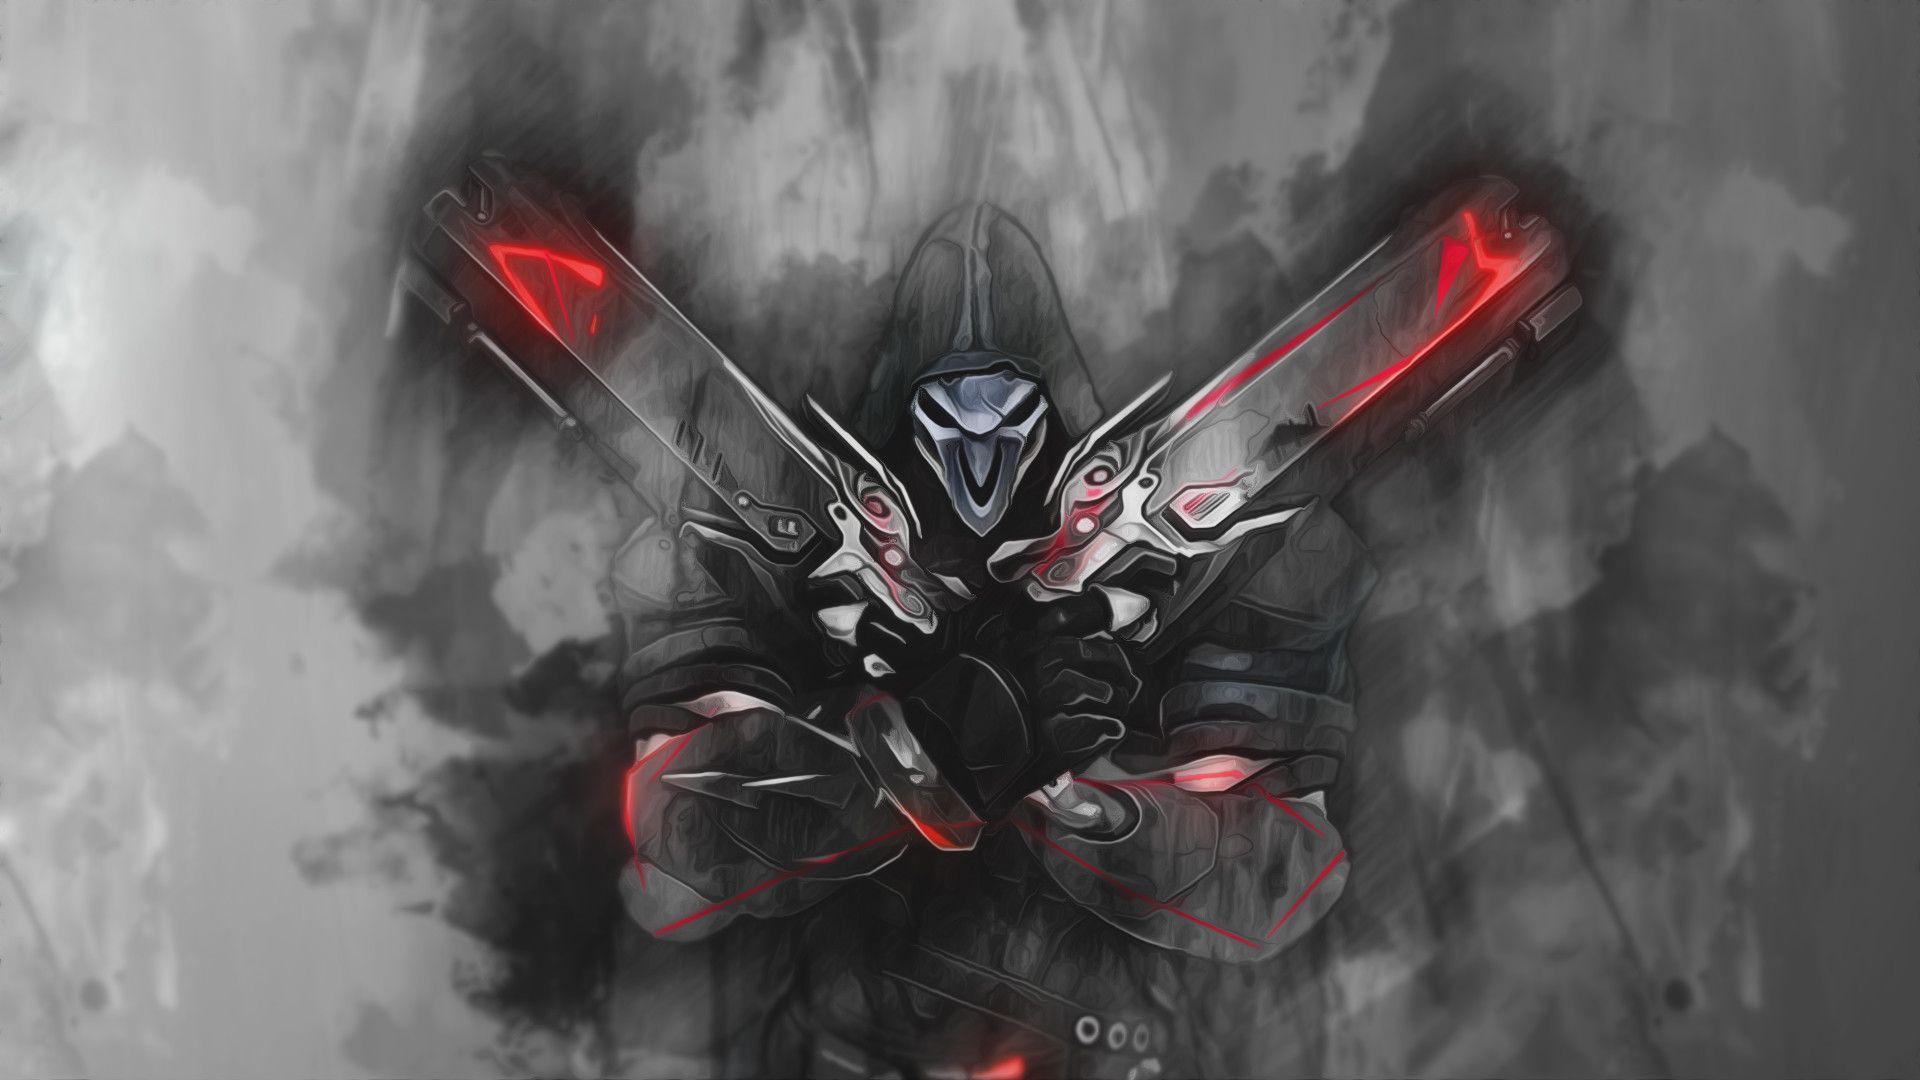 1920x1080 Reaper - Overwatch Wallpaper by ...